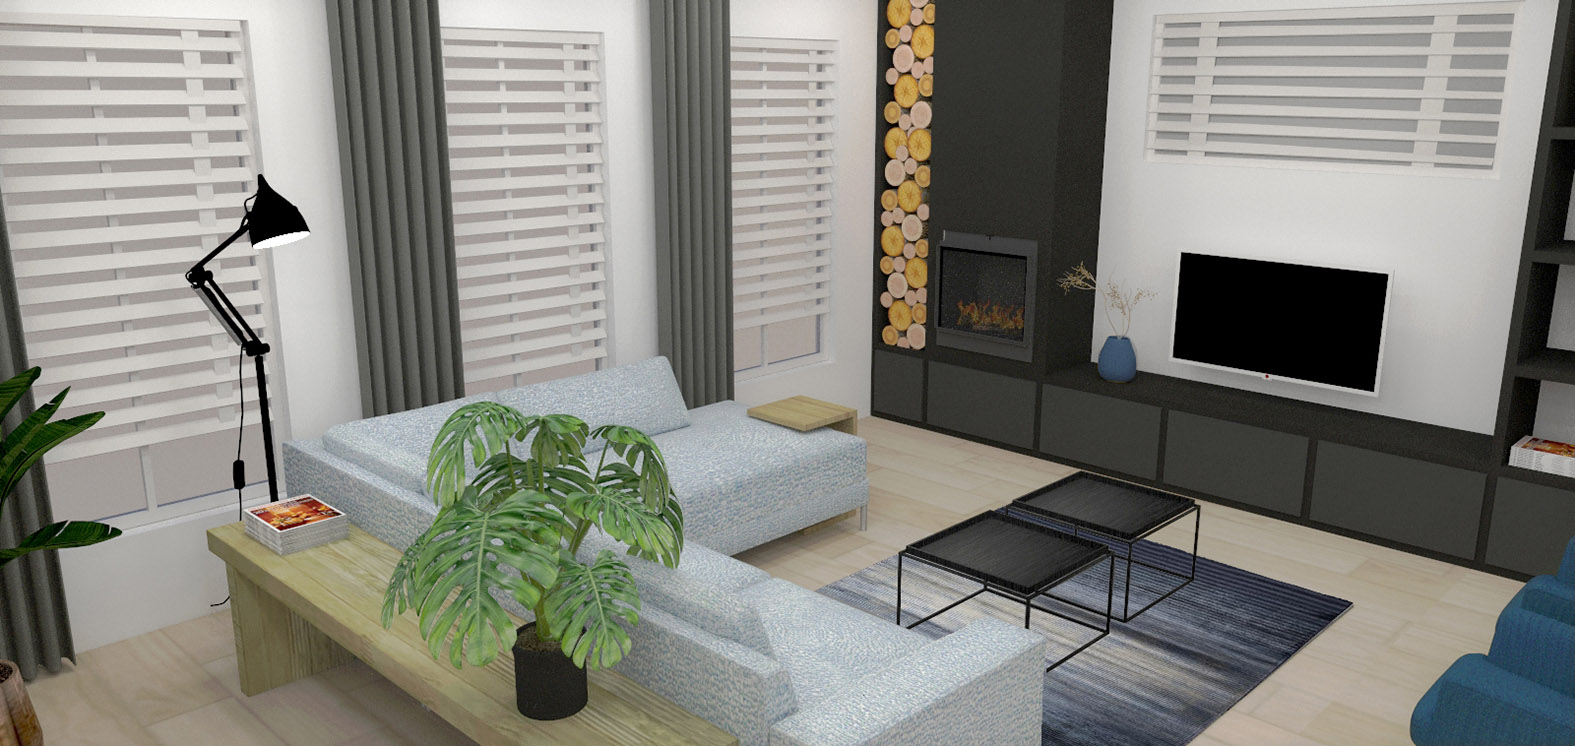 Huiskamer interieuradvies binnenhuisarchitectuur drunen elshout styling 3d visualisatie